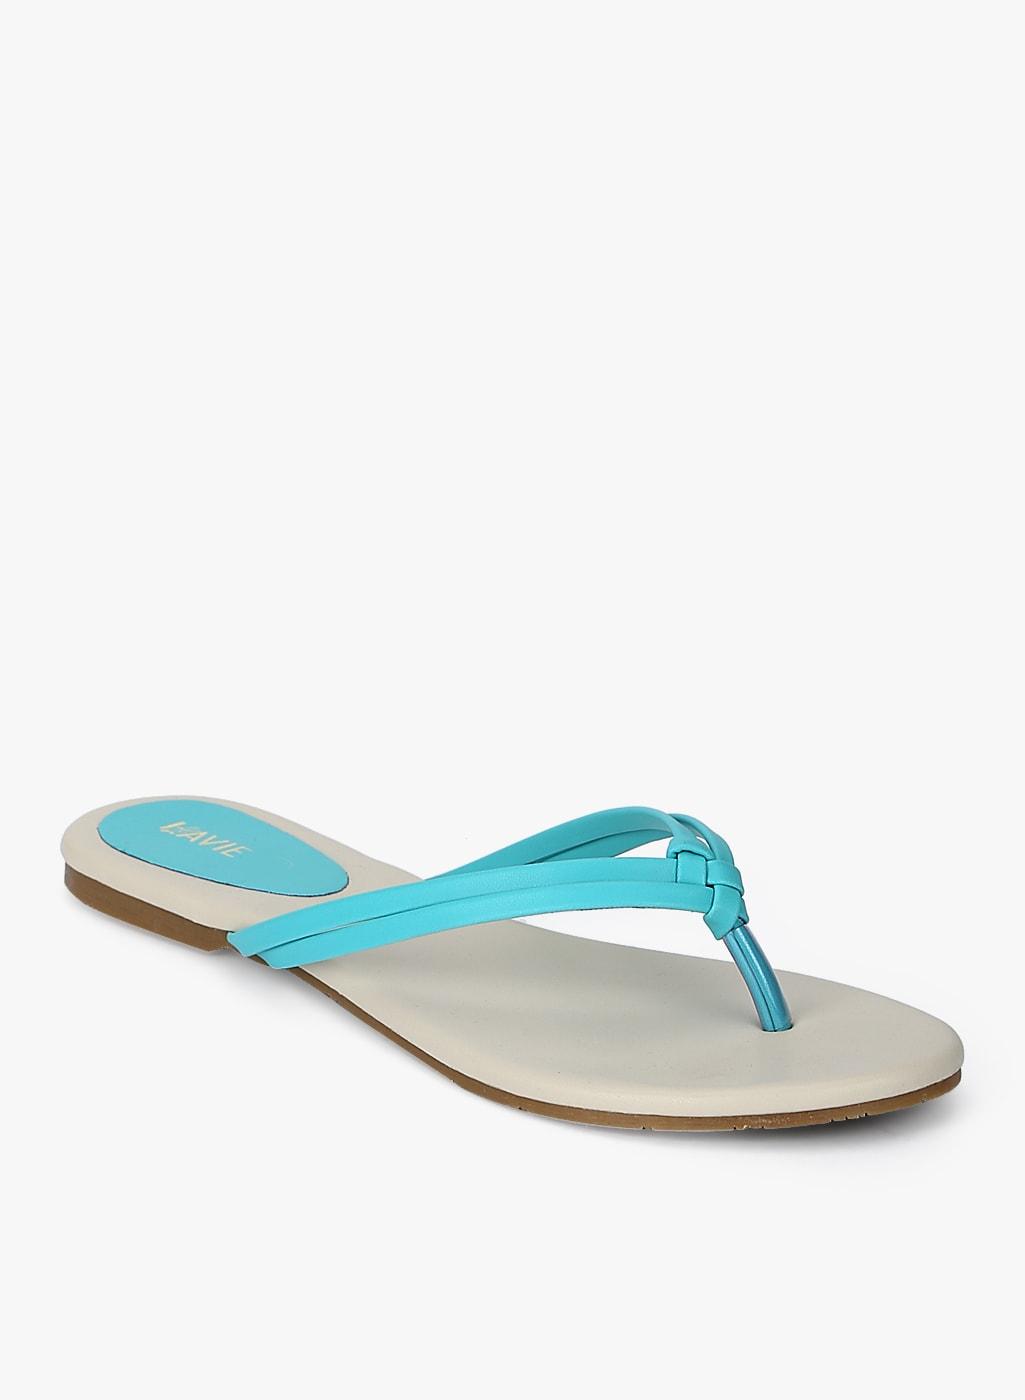 a3f23bd151ed Buy Puma Women Blue Glady Ind Flats - Flats for Women 109202